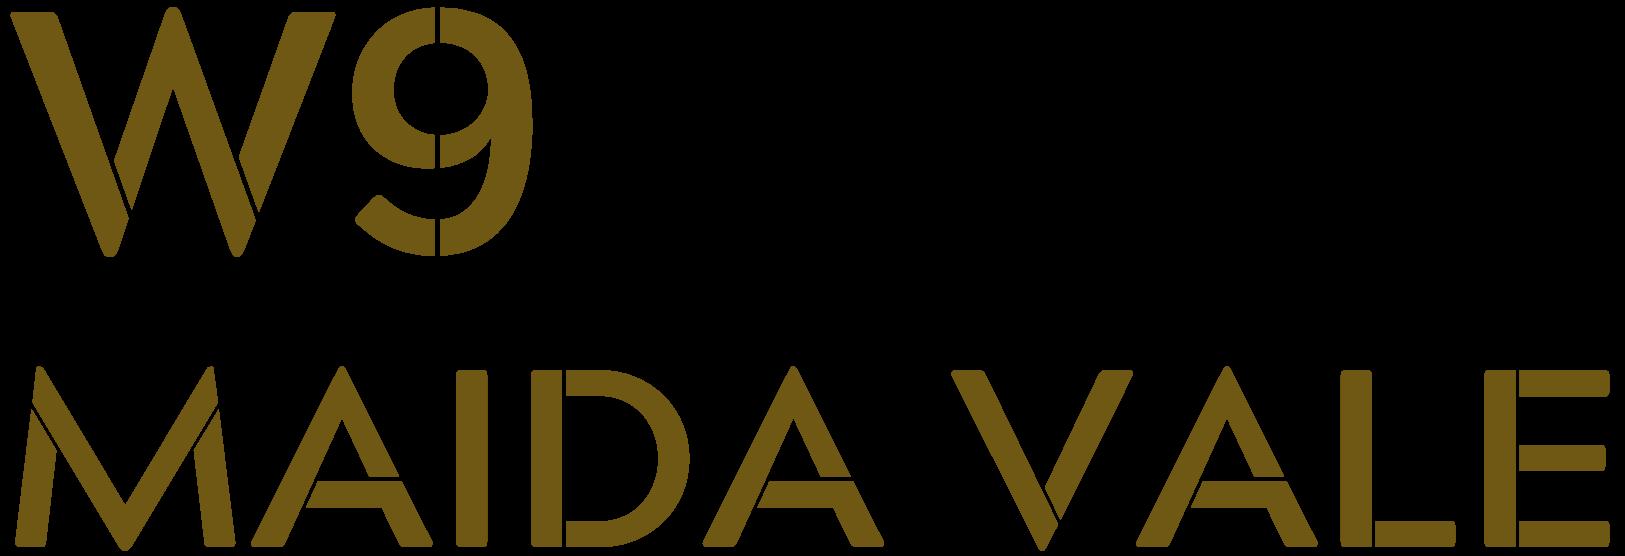 W9 Maida Vale Logo in Gold